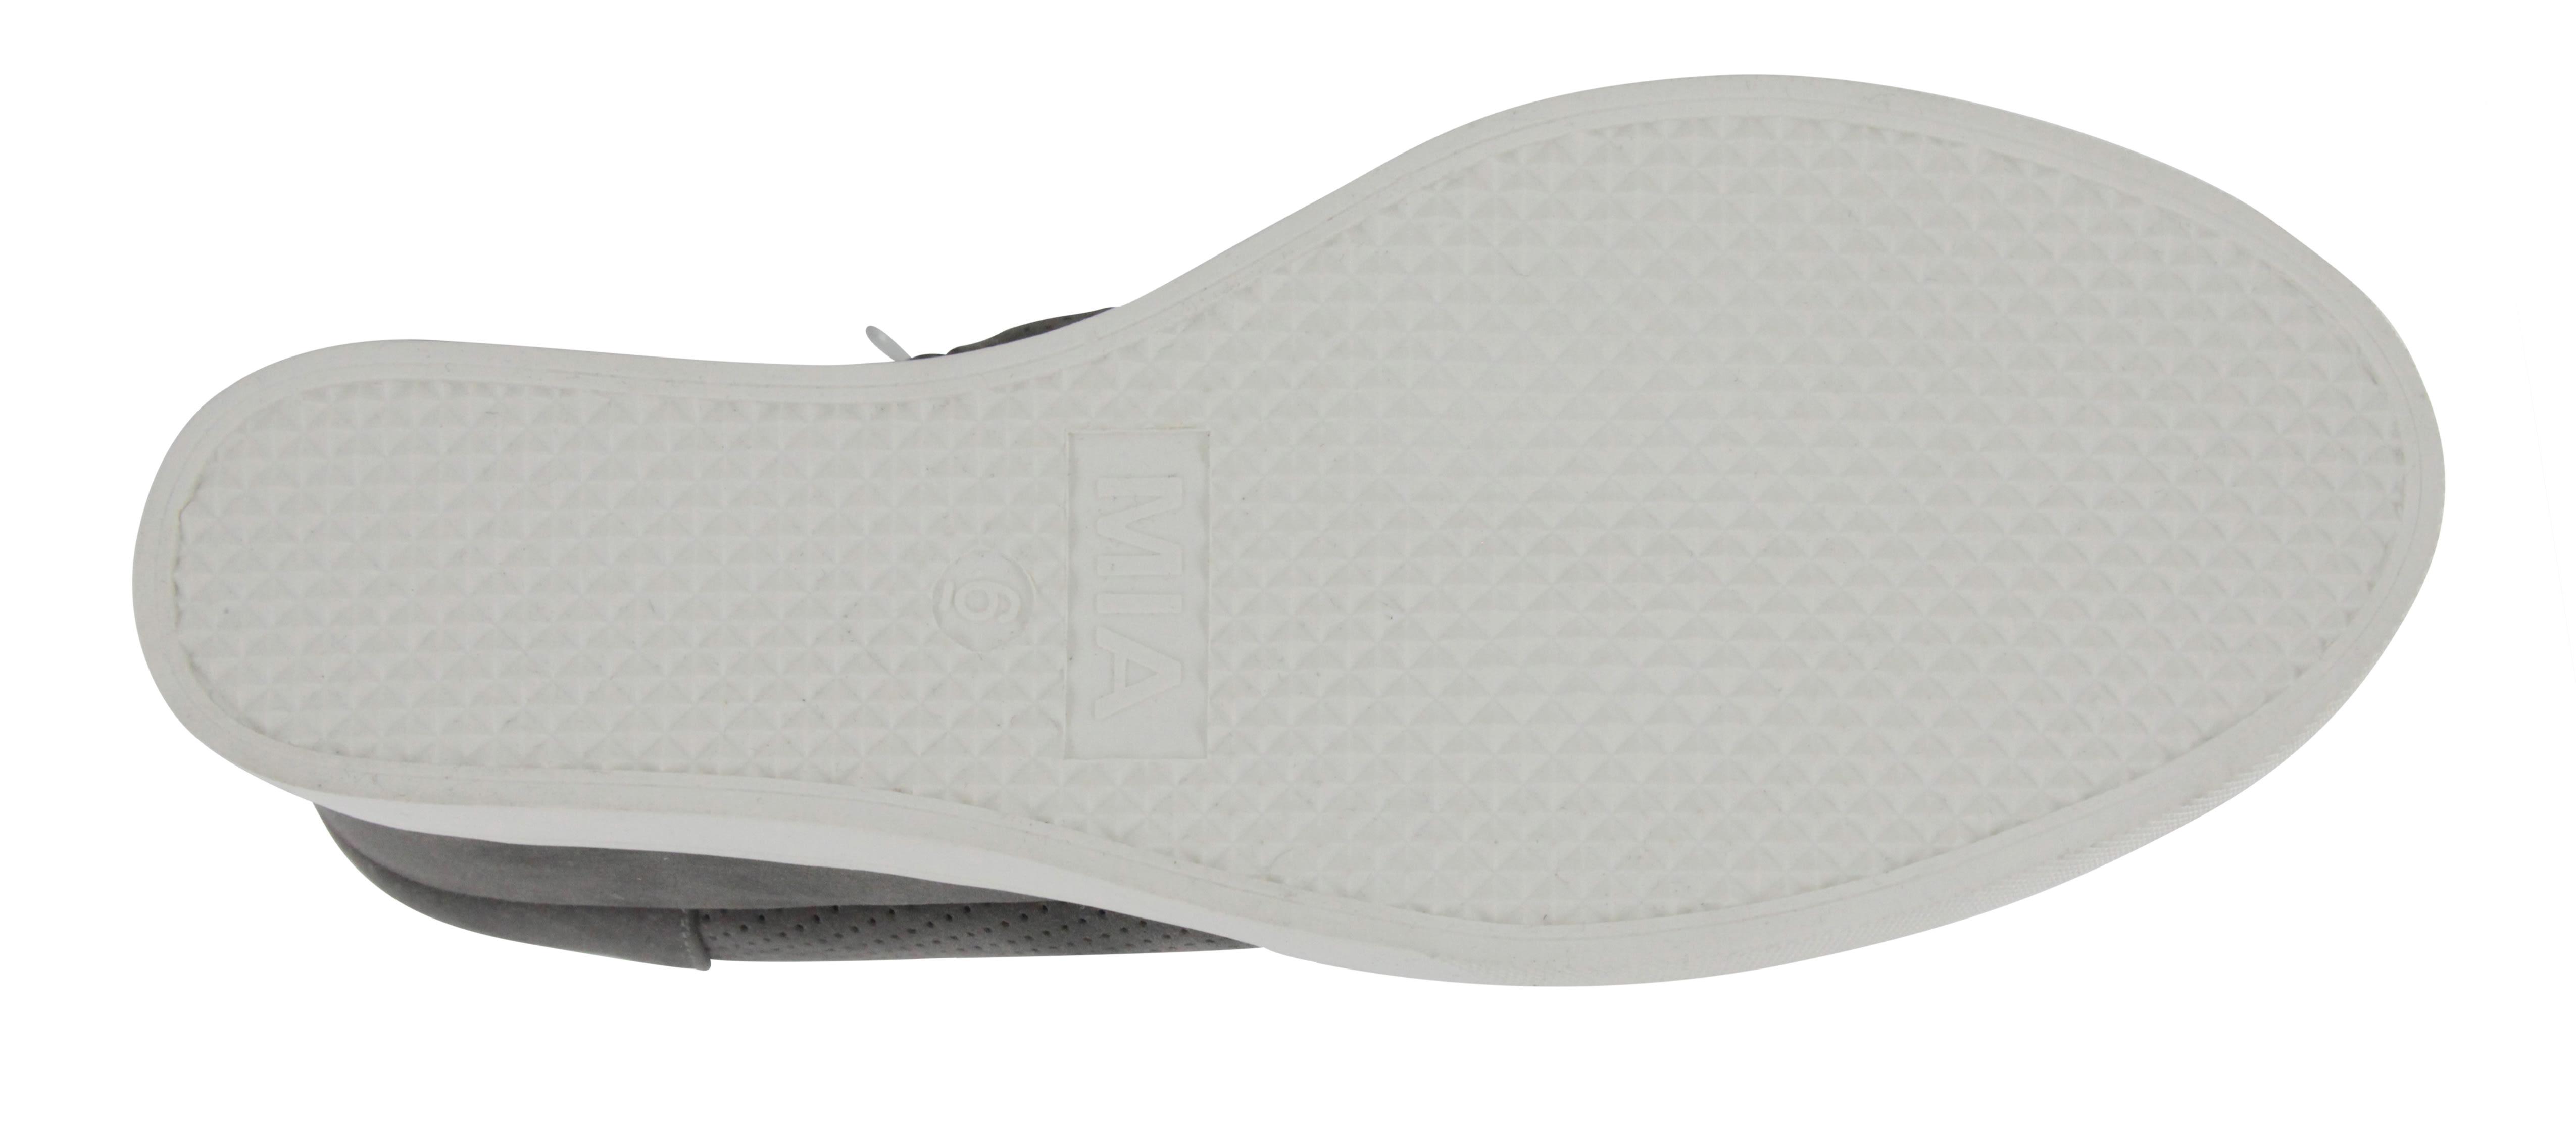 Mia Cristie Wedge Sneaker - grey - Front